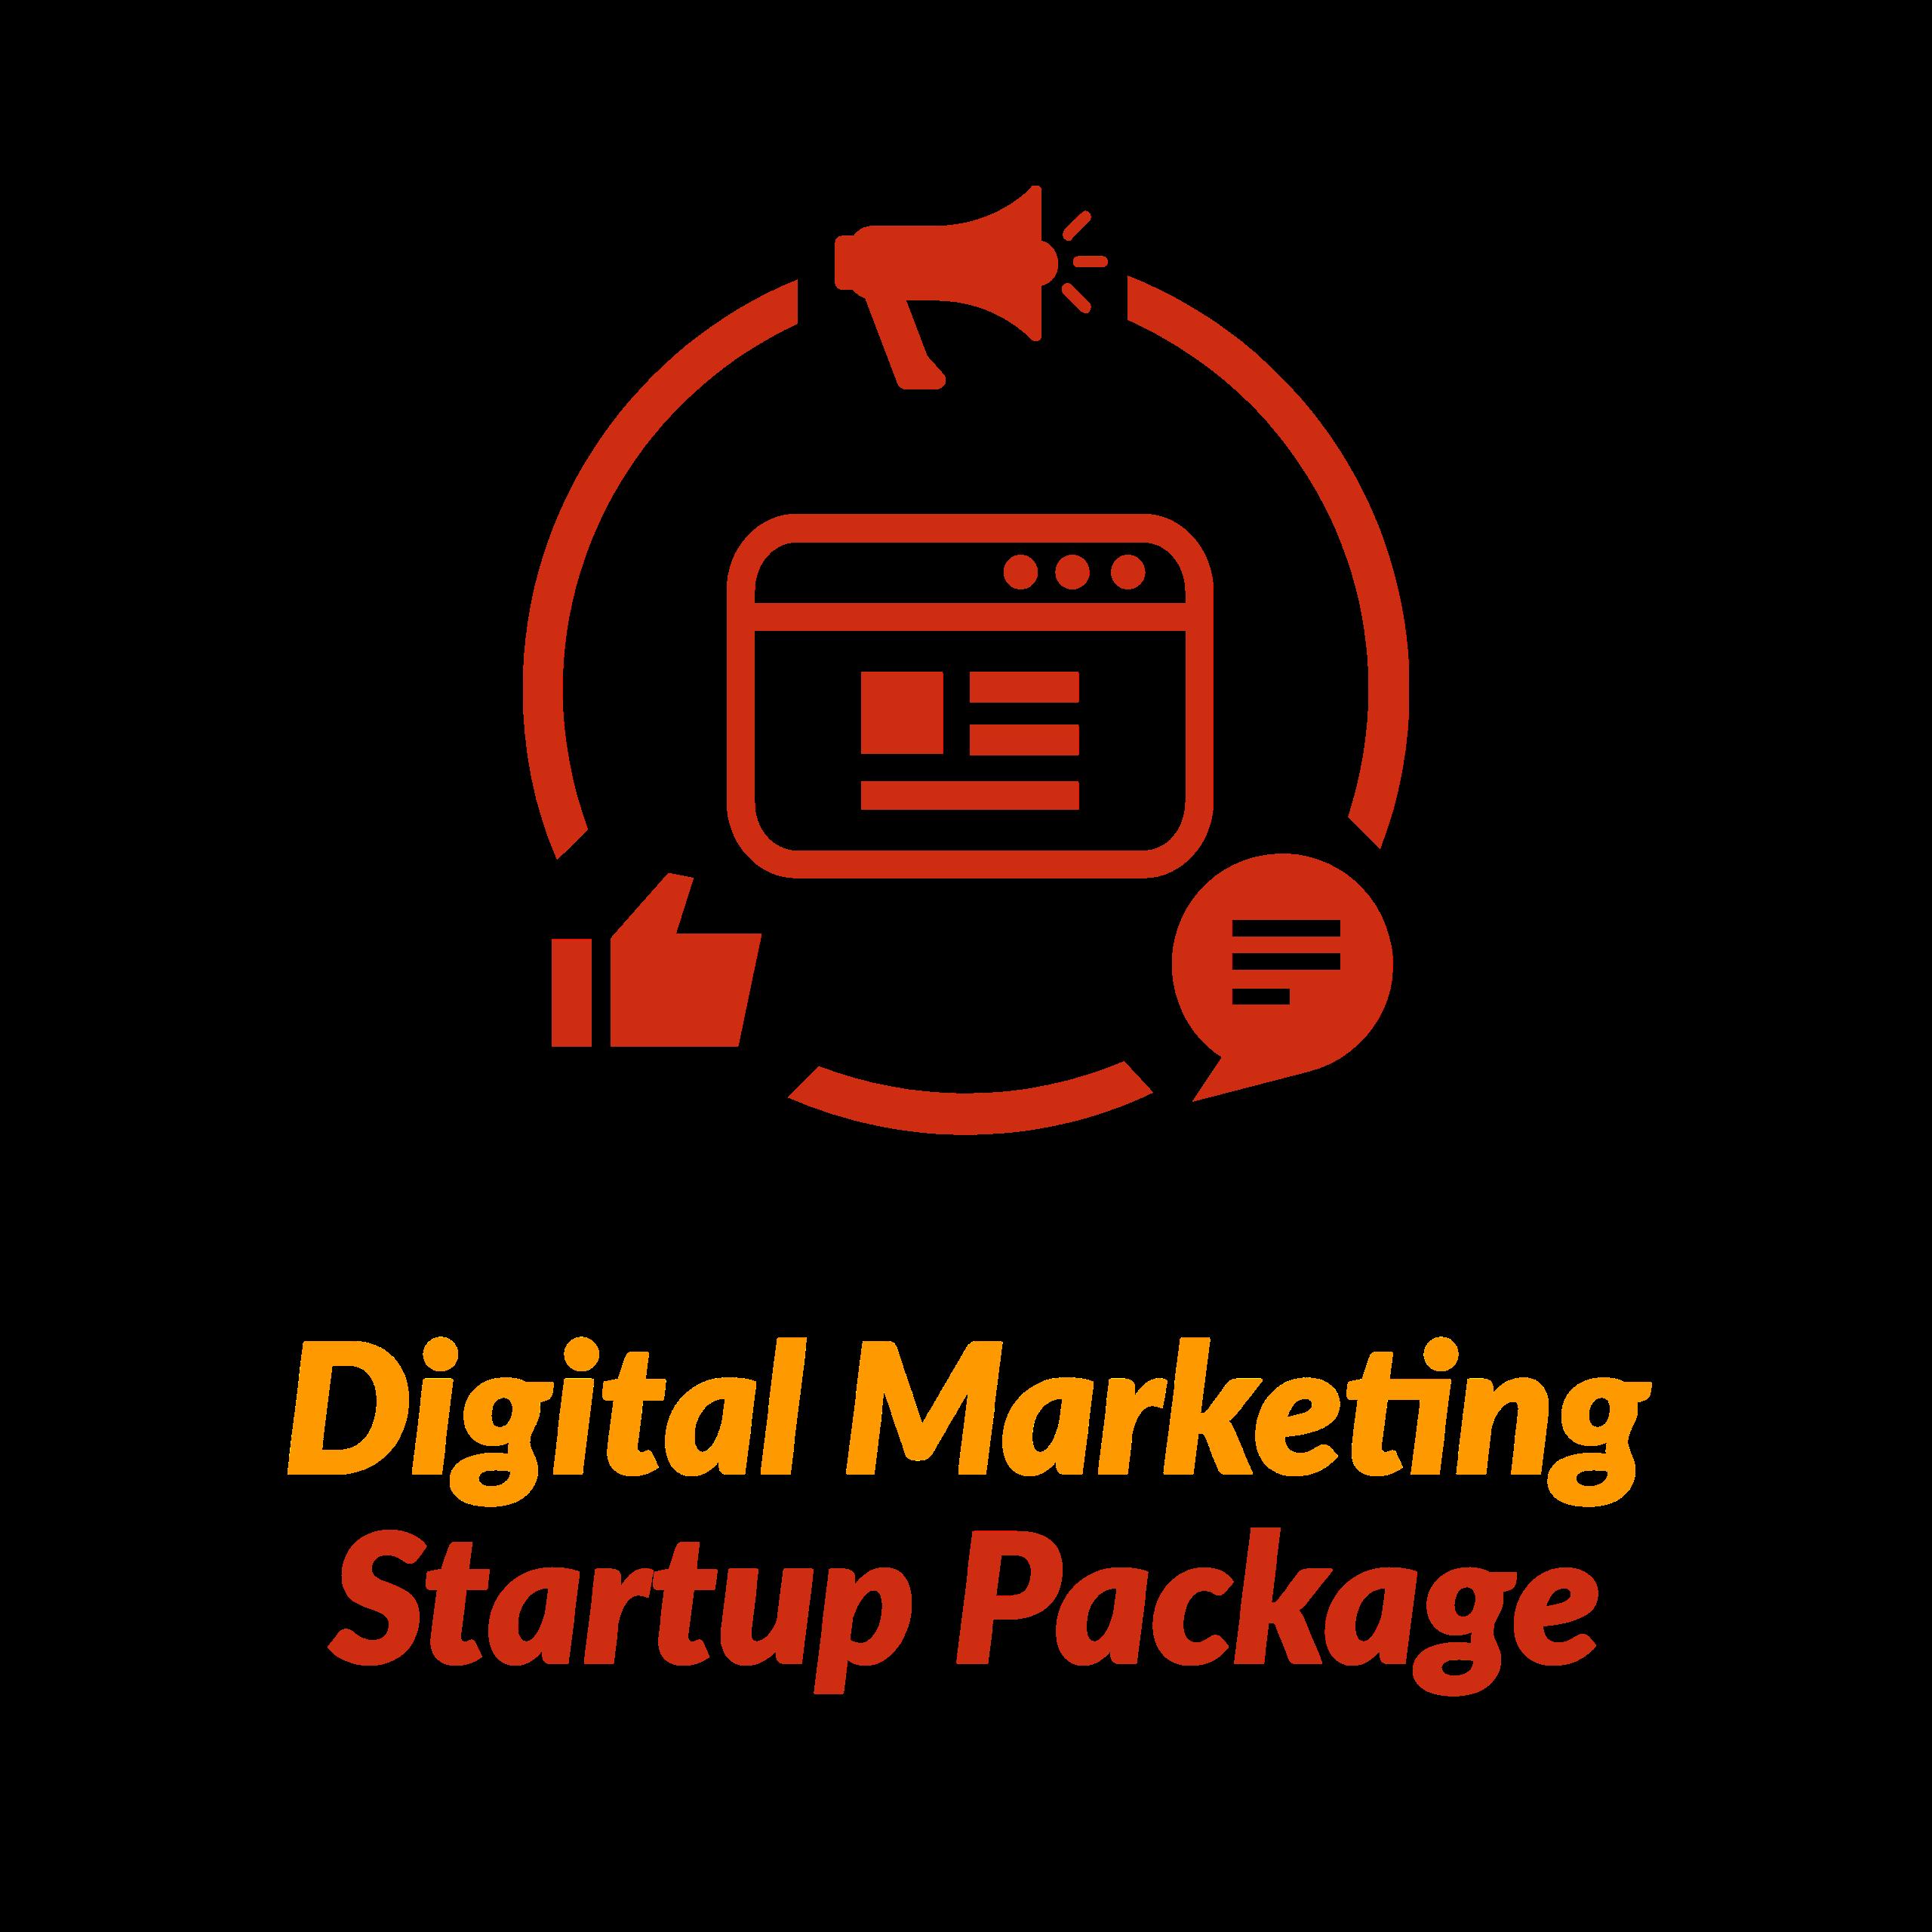 Digital Marketing Startup Package